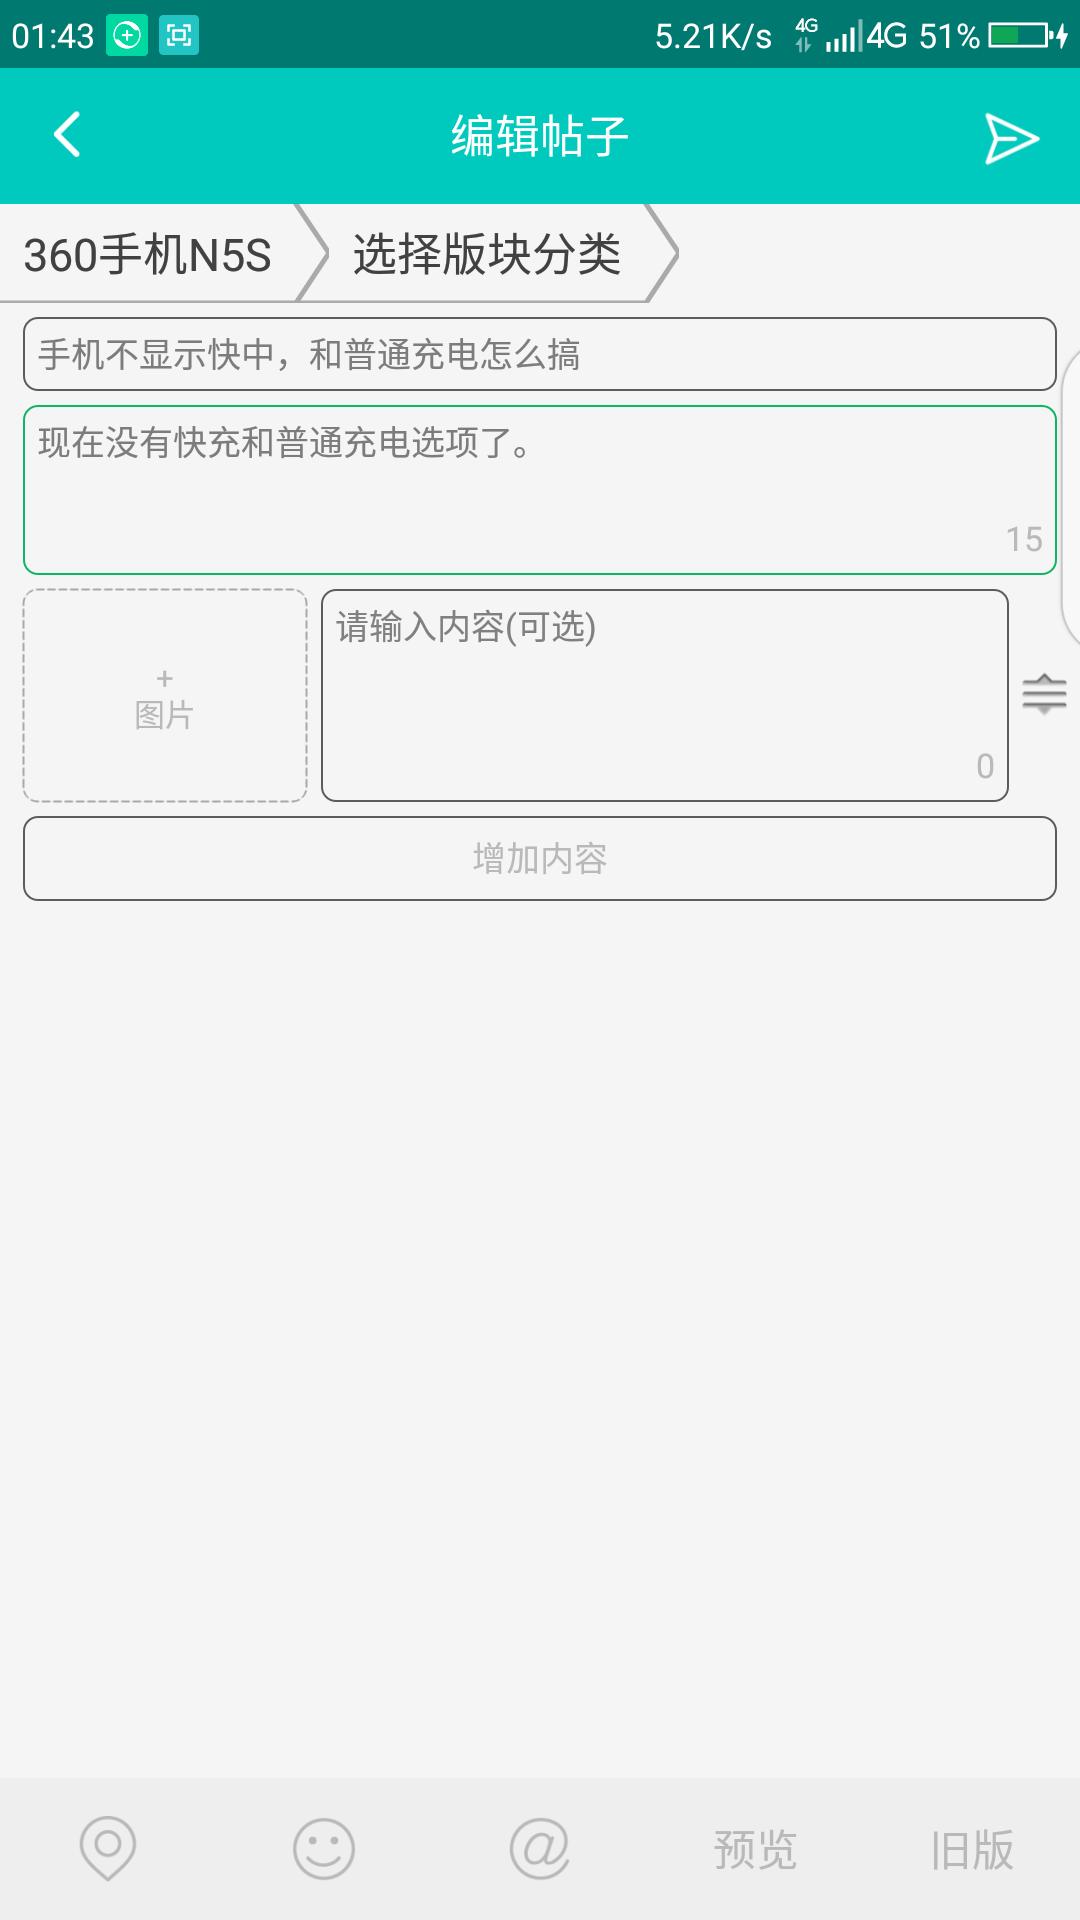 Screenshot_2017-11-07-01-43-07.png